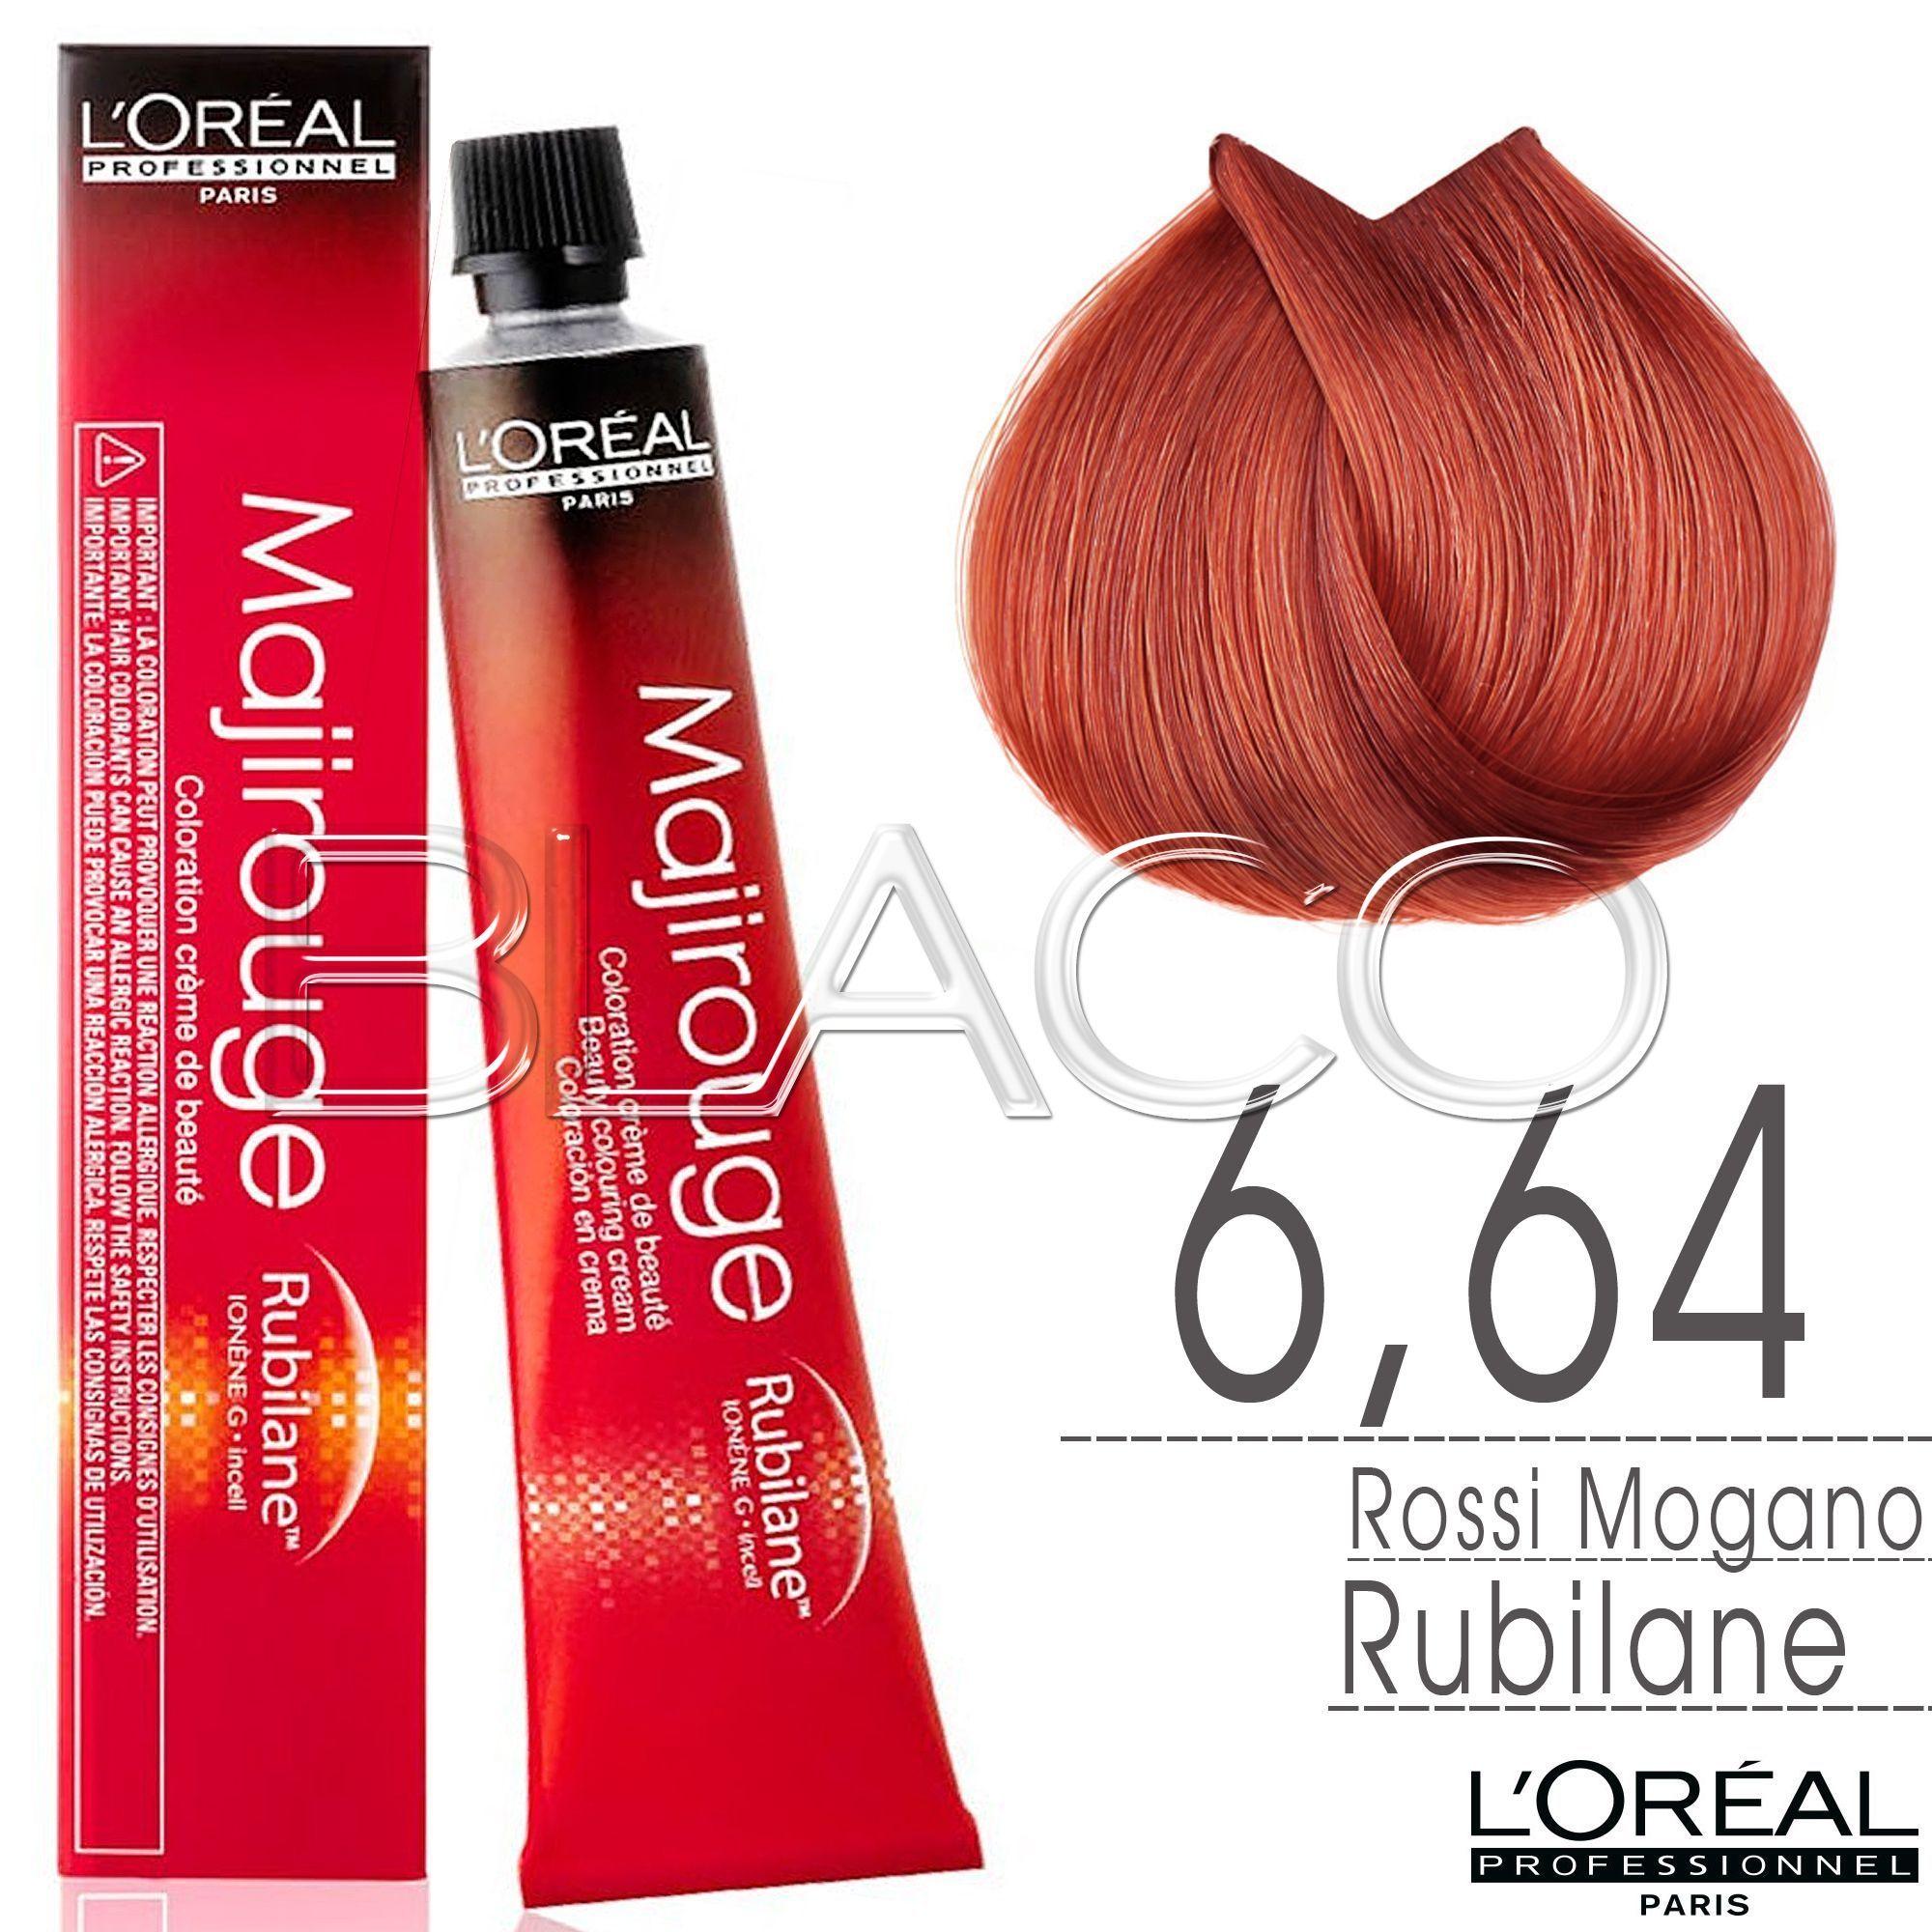 Loreal majirouge 664 hada googlom farba na vlasy pinterest loreal majirouge 664 hada googlom nvjuhfo Images